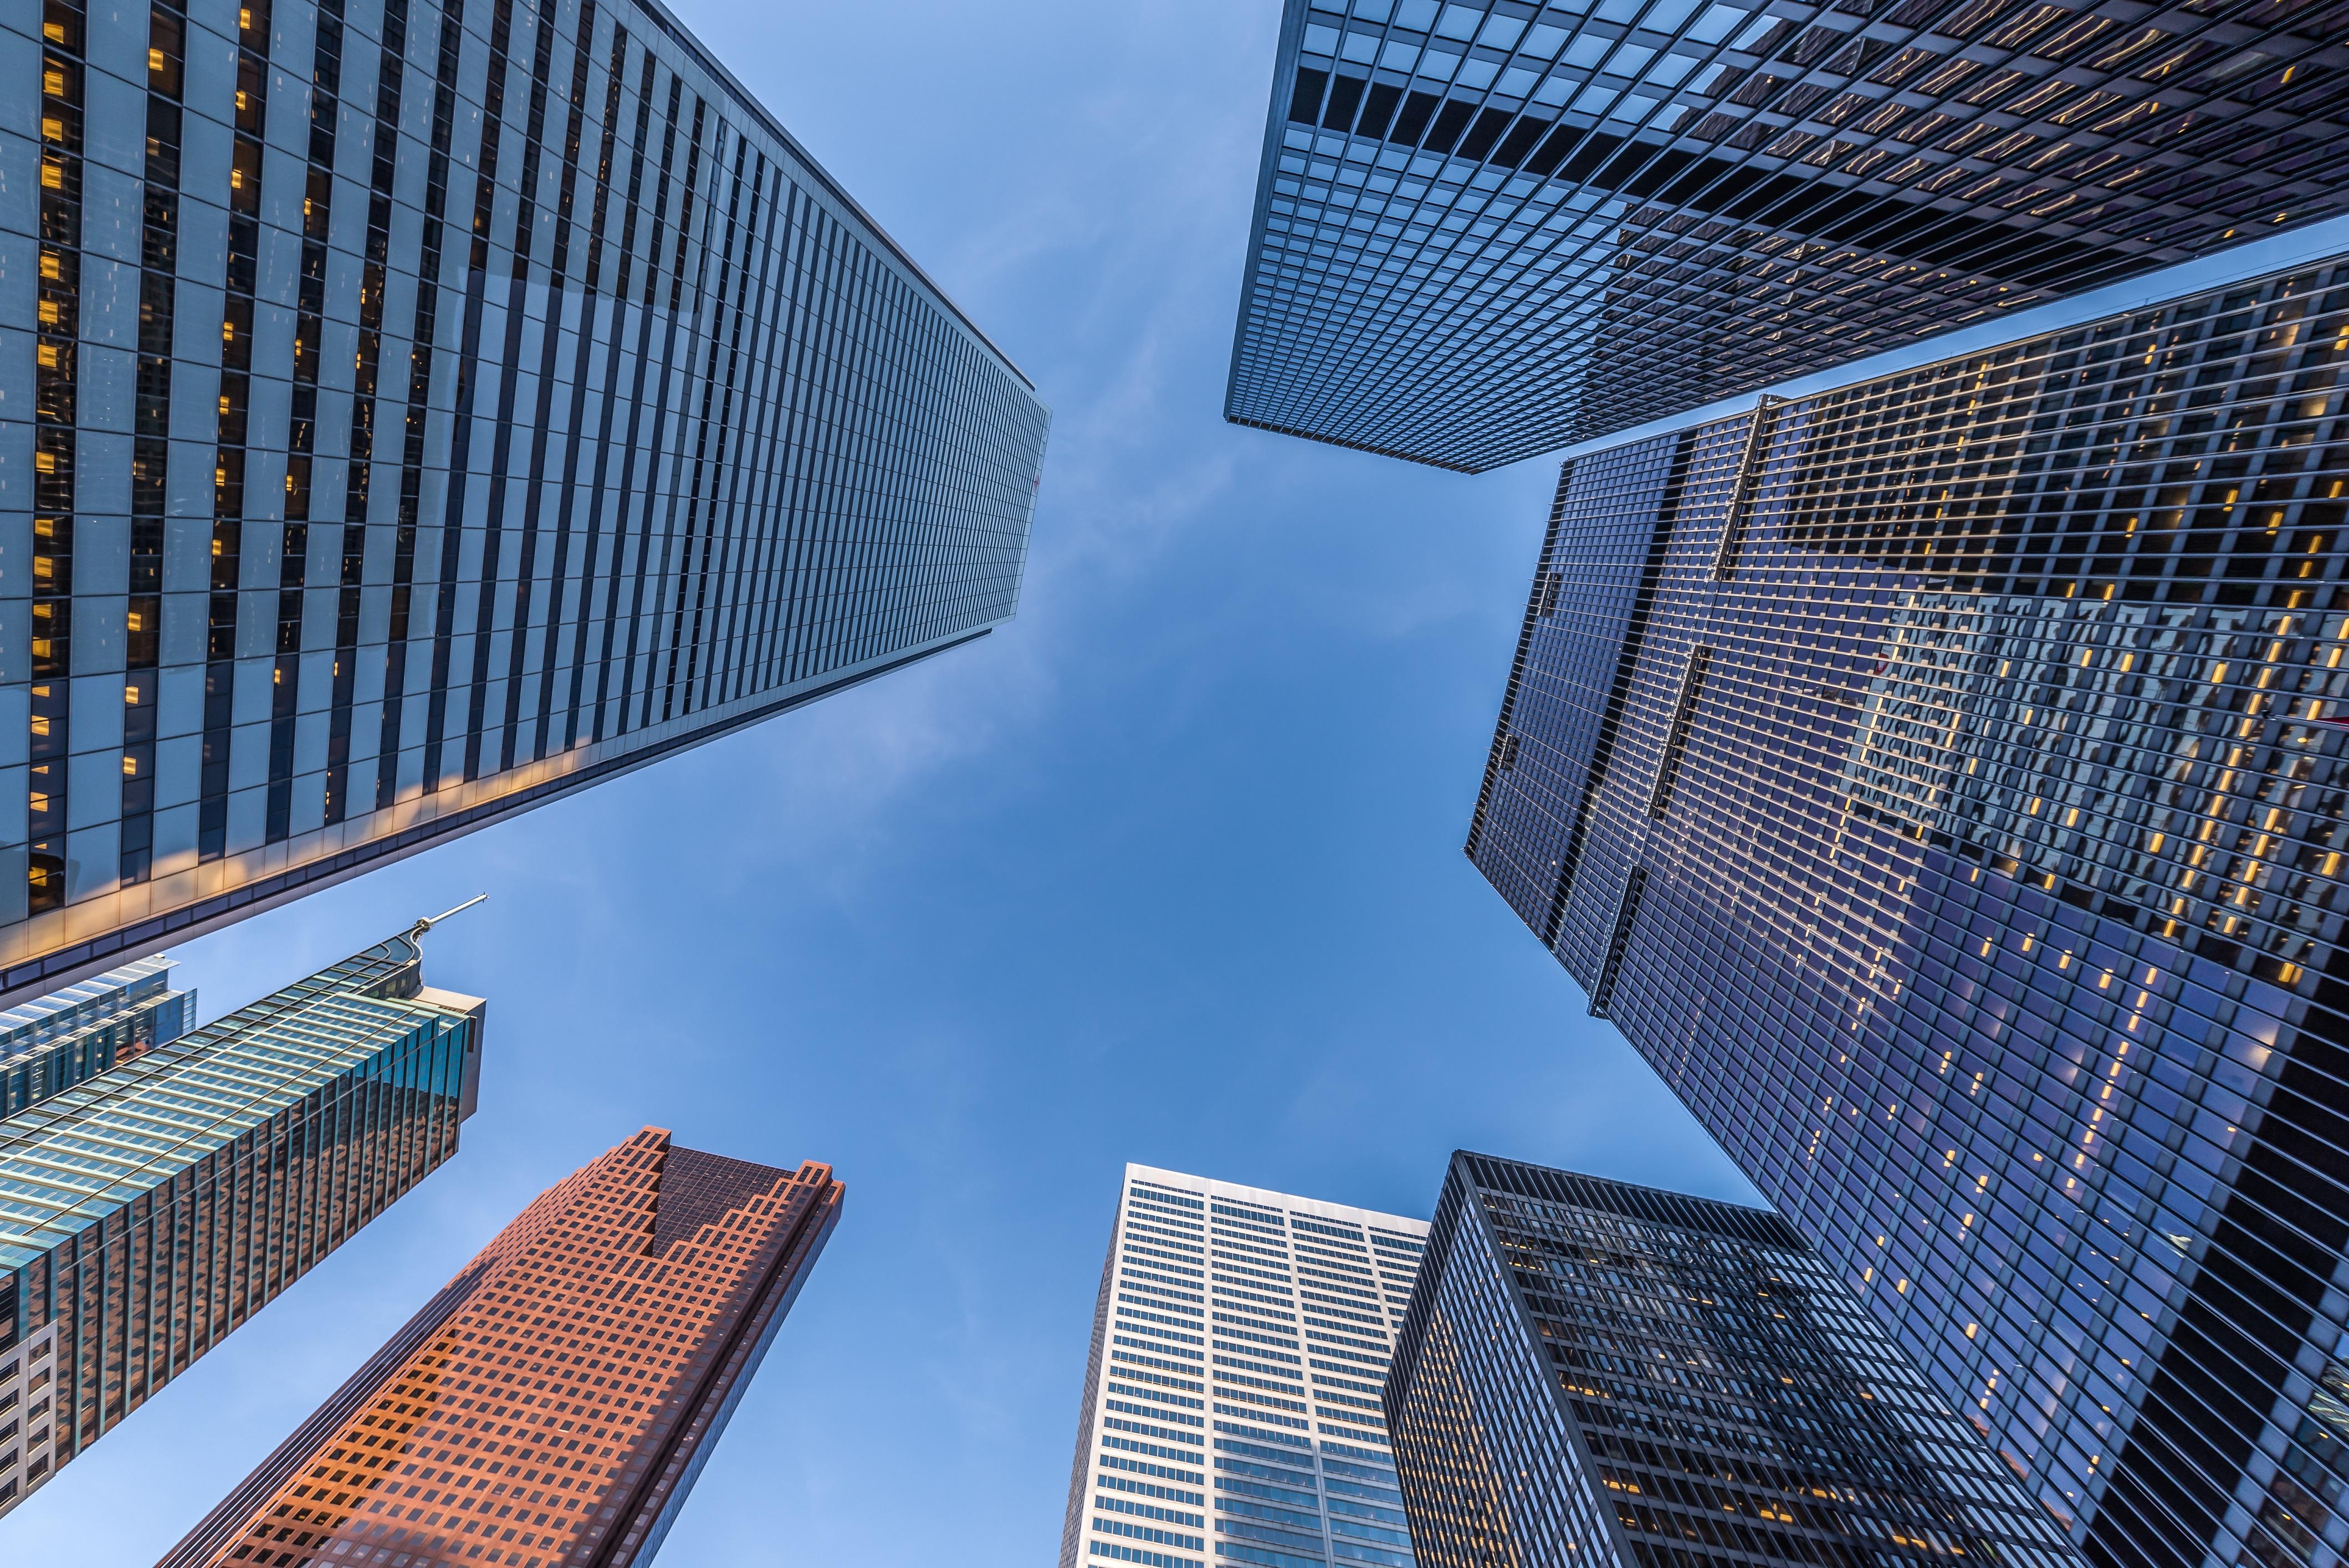 shutterstock_tall buildings Toronto